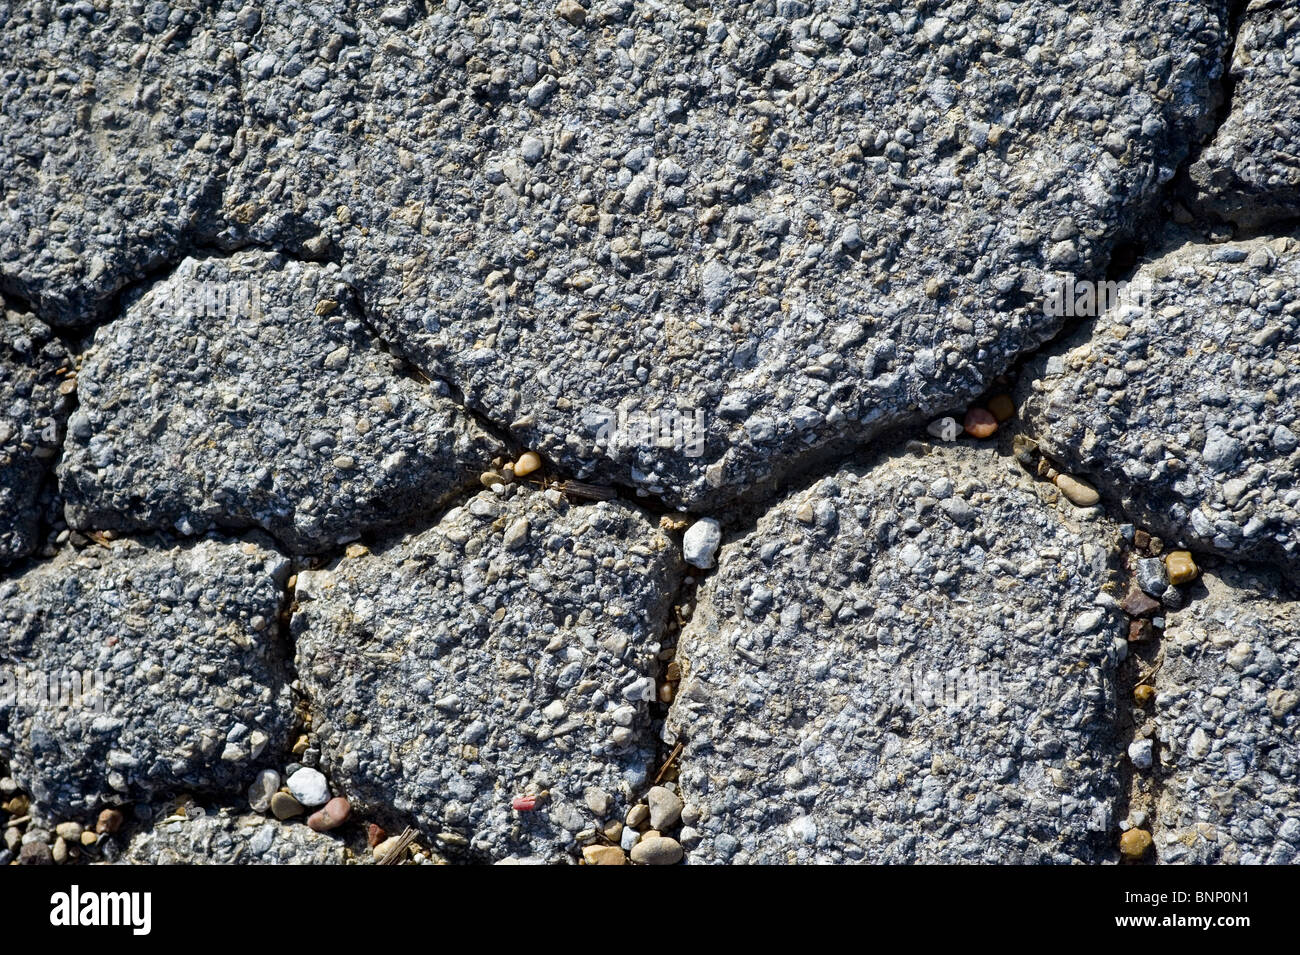 Pavement/Asphalt Cracked - Stock Image